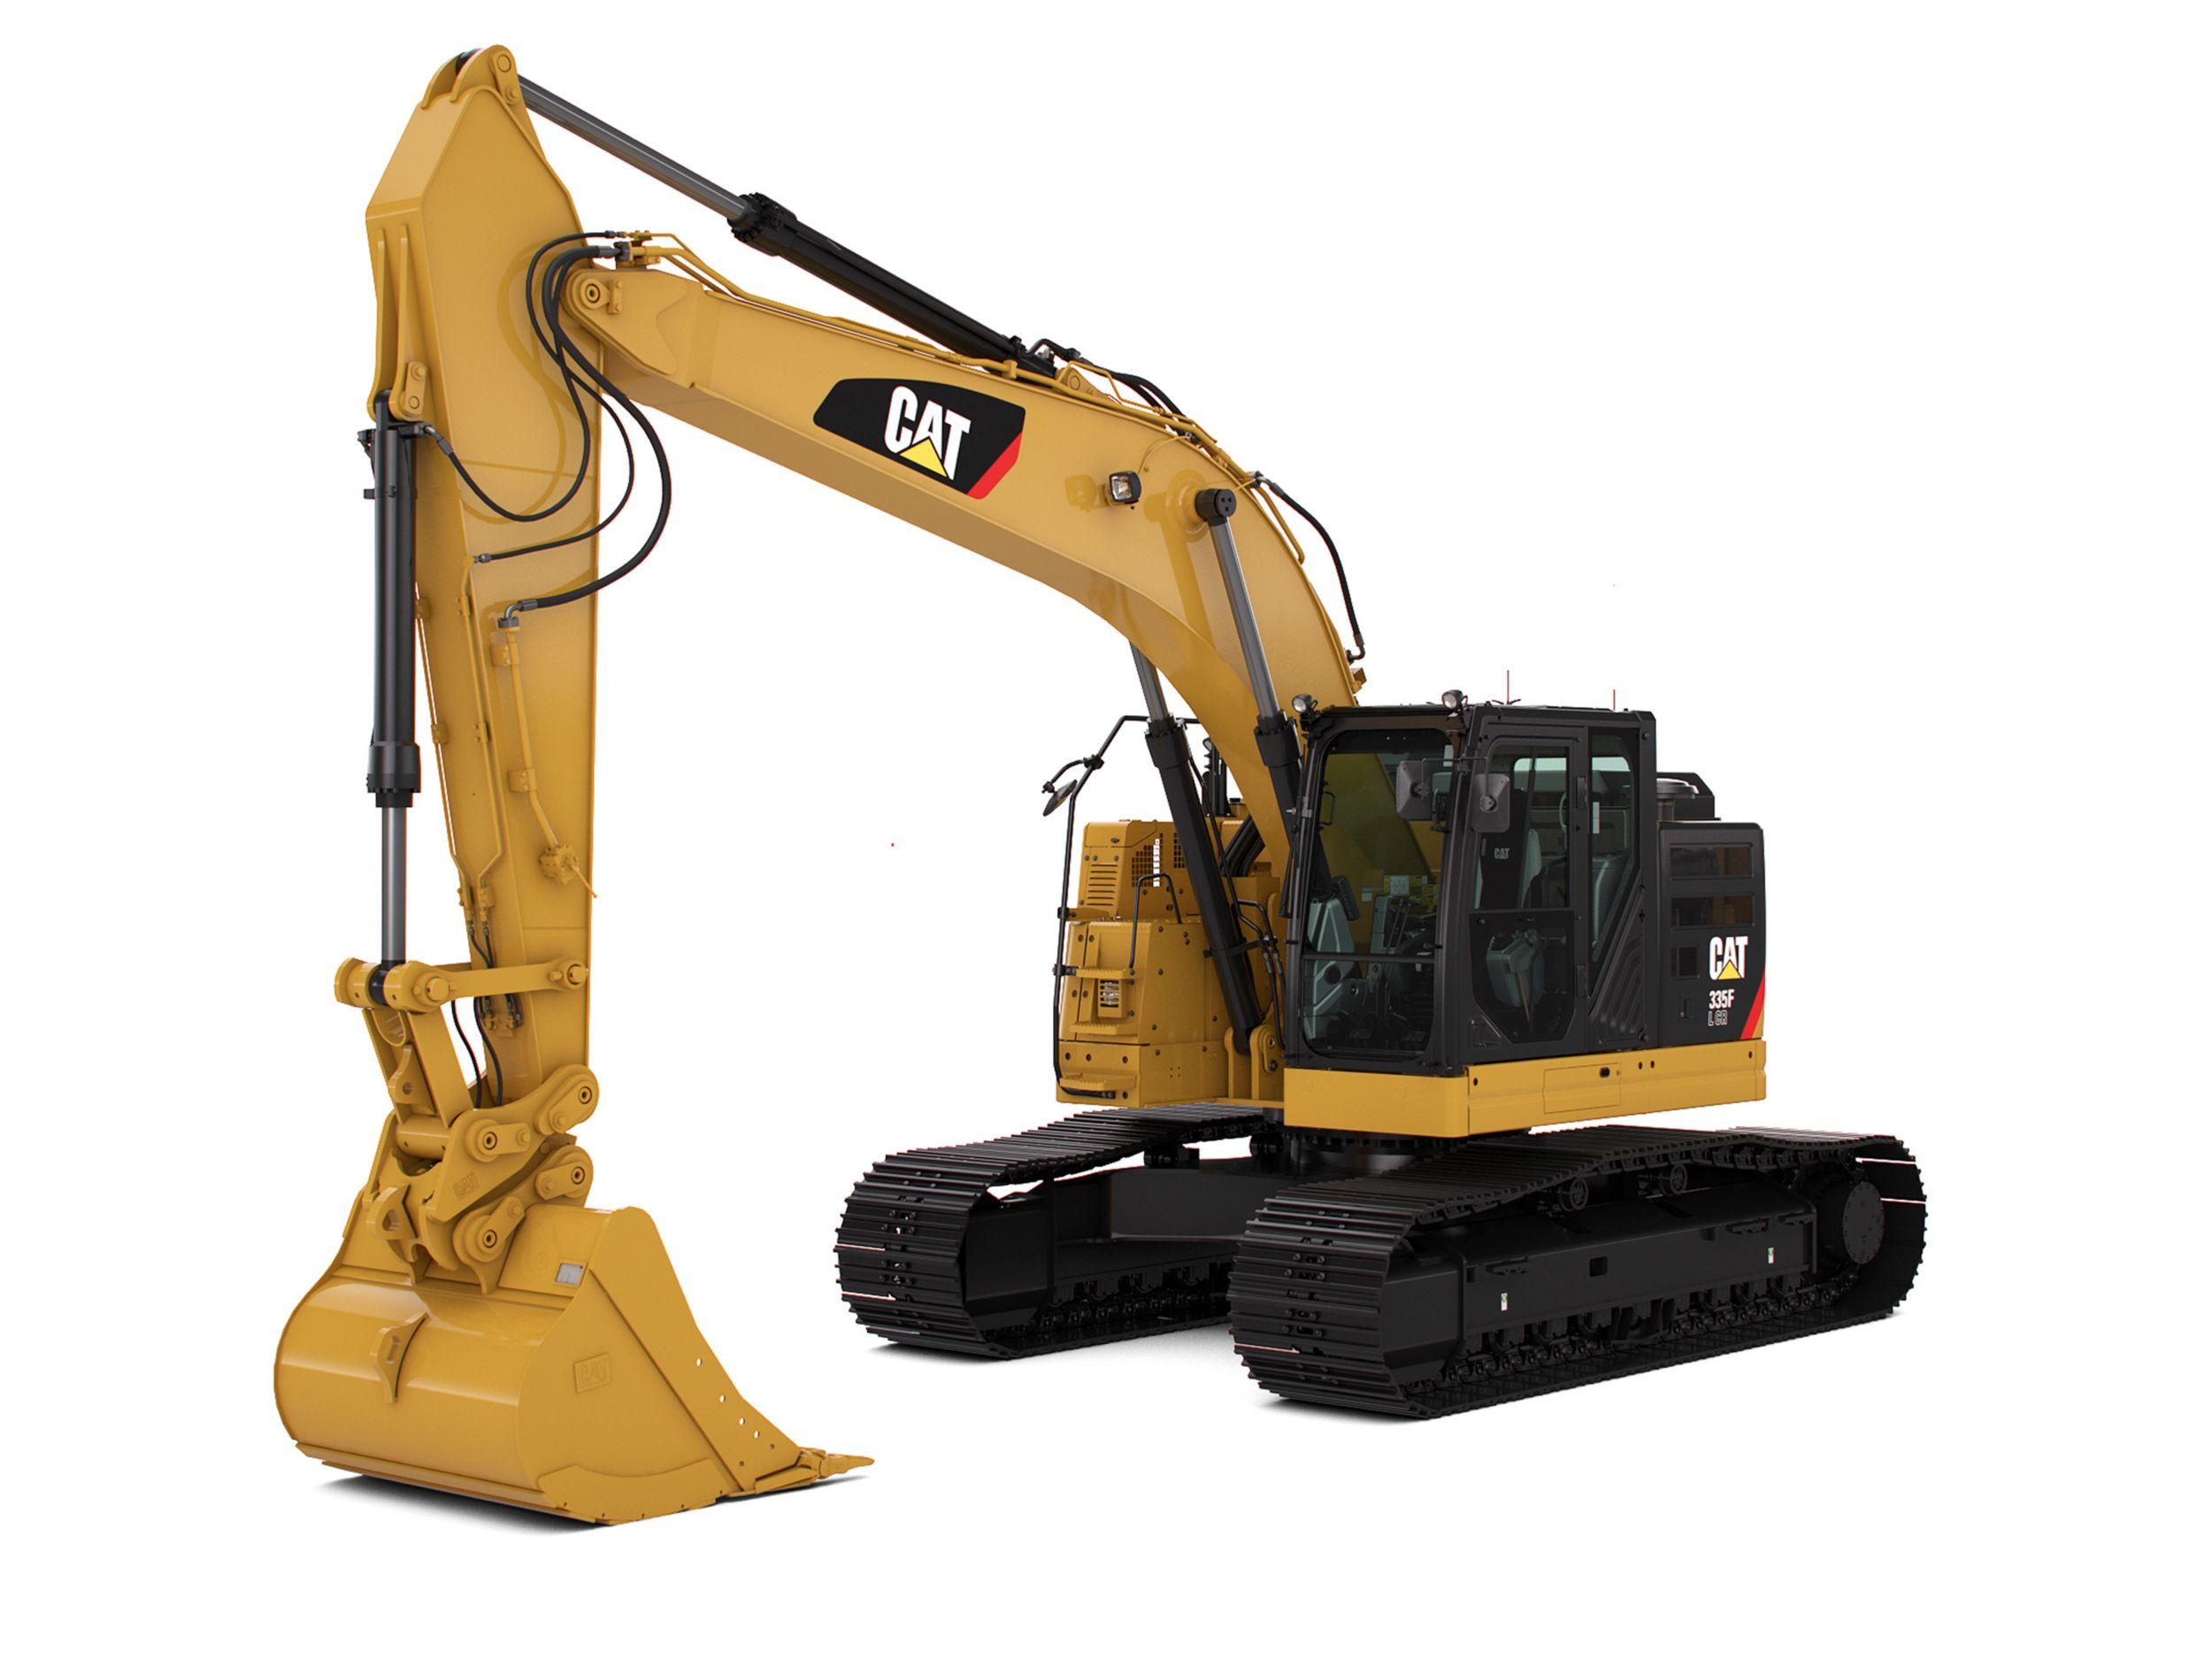 335F L Hydraulic Excavator